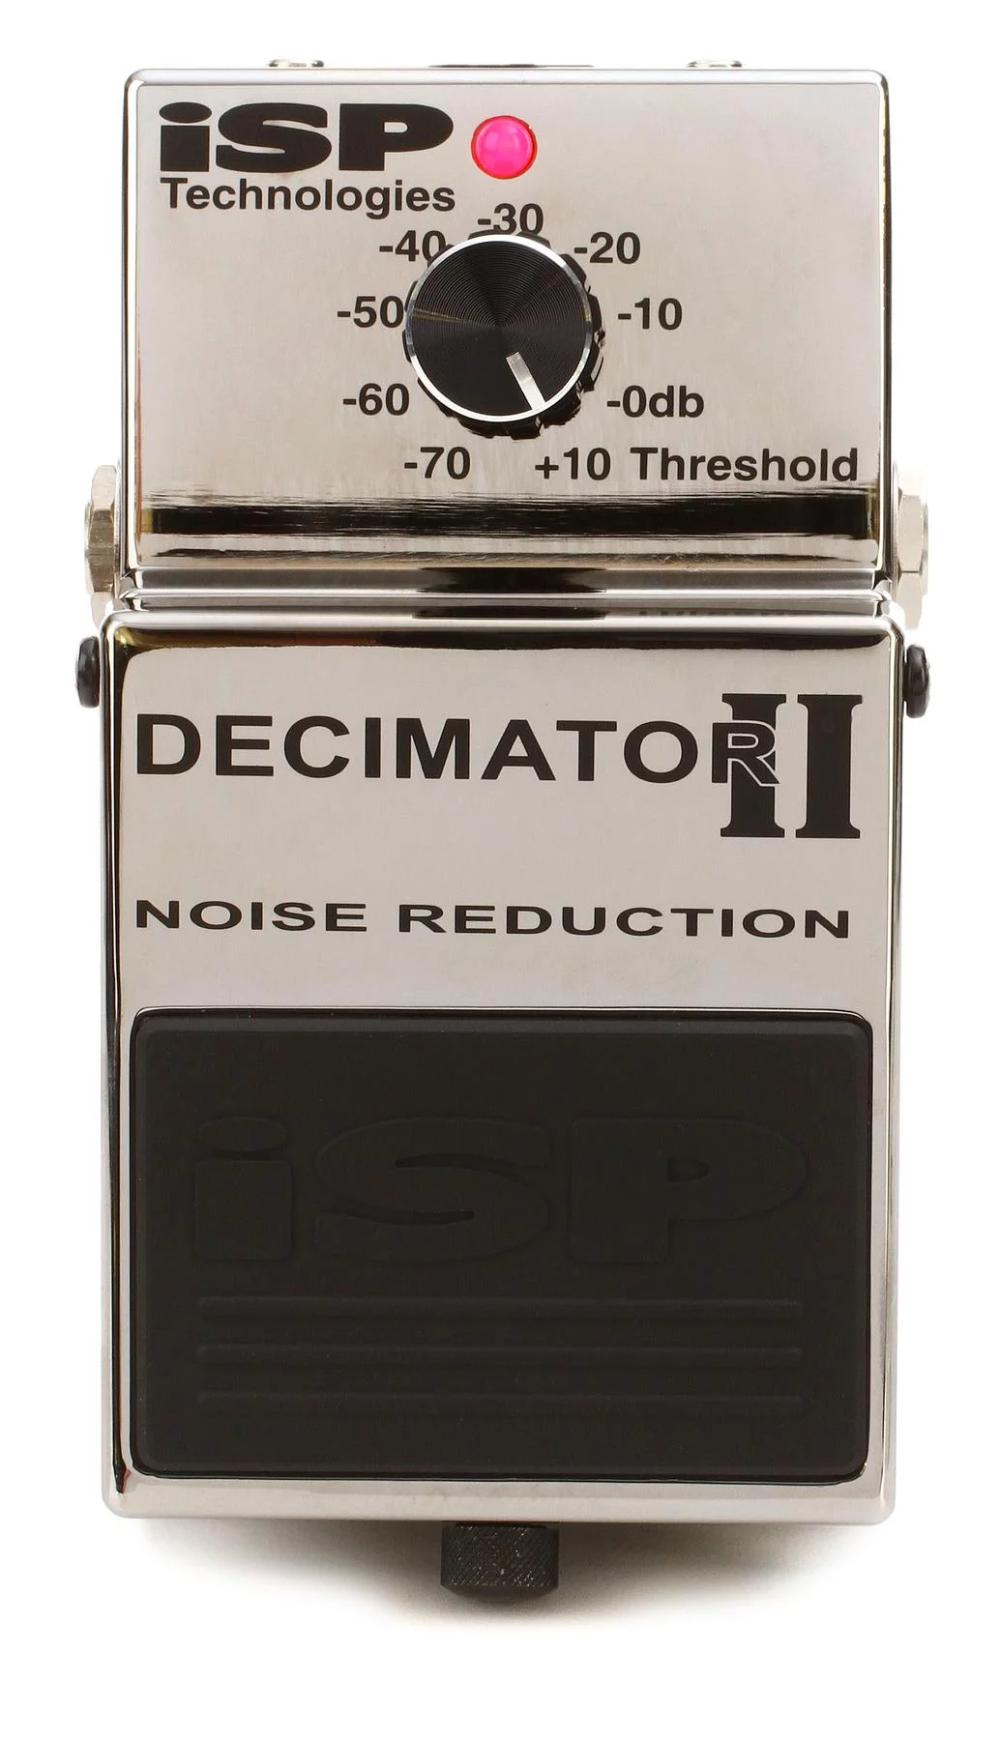 ISP Technologies Decimator II Noise Reduction Pedal #decimator #ISP #noise #peda... #decimator #ISP #noise #peda #pedal #reduction #technologies